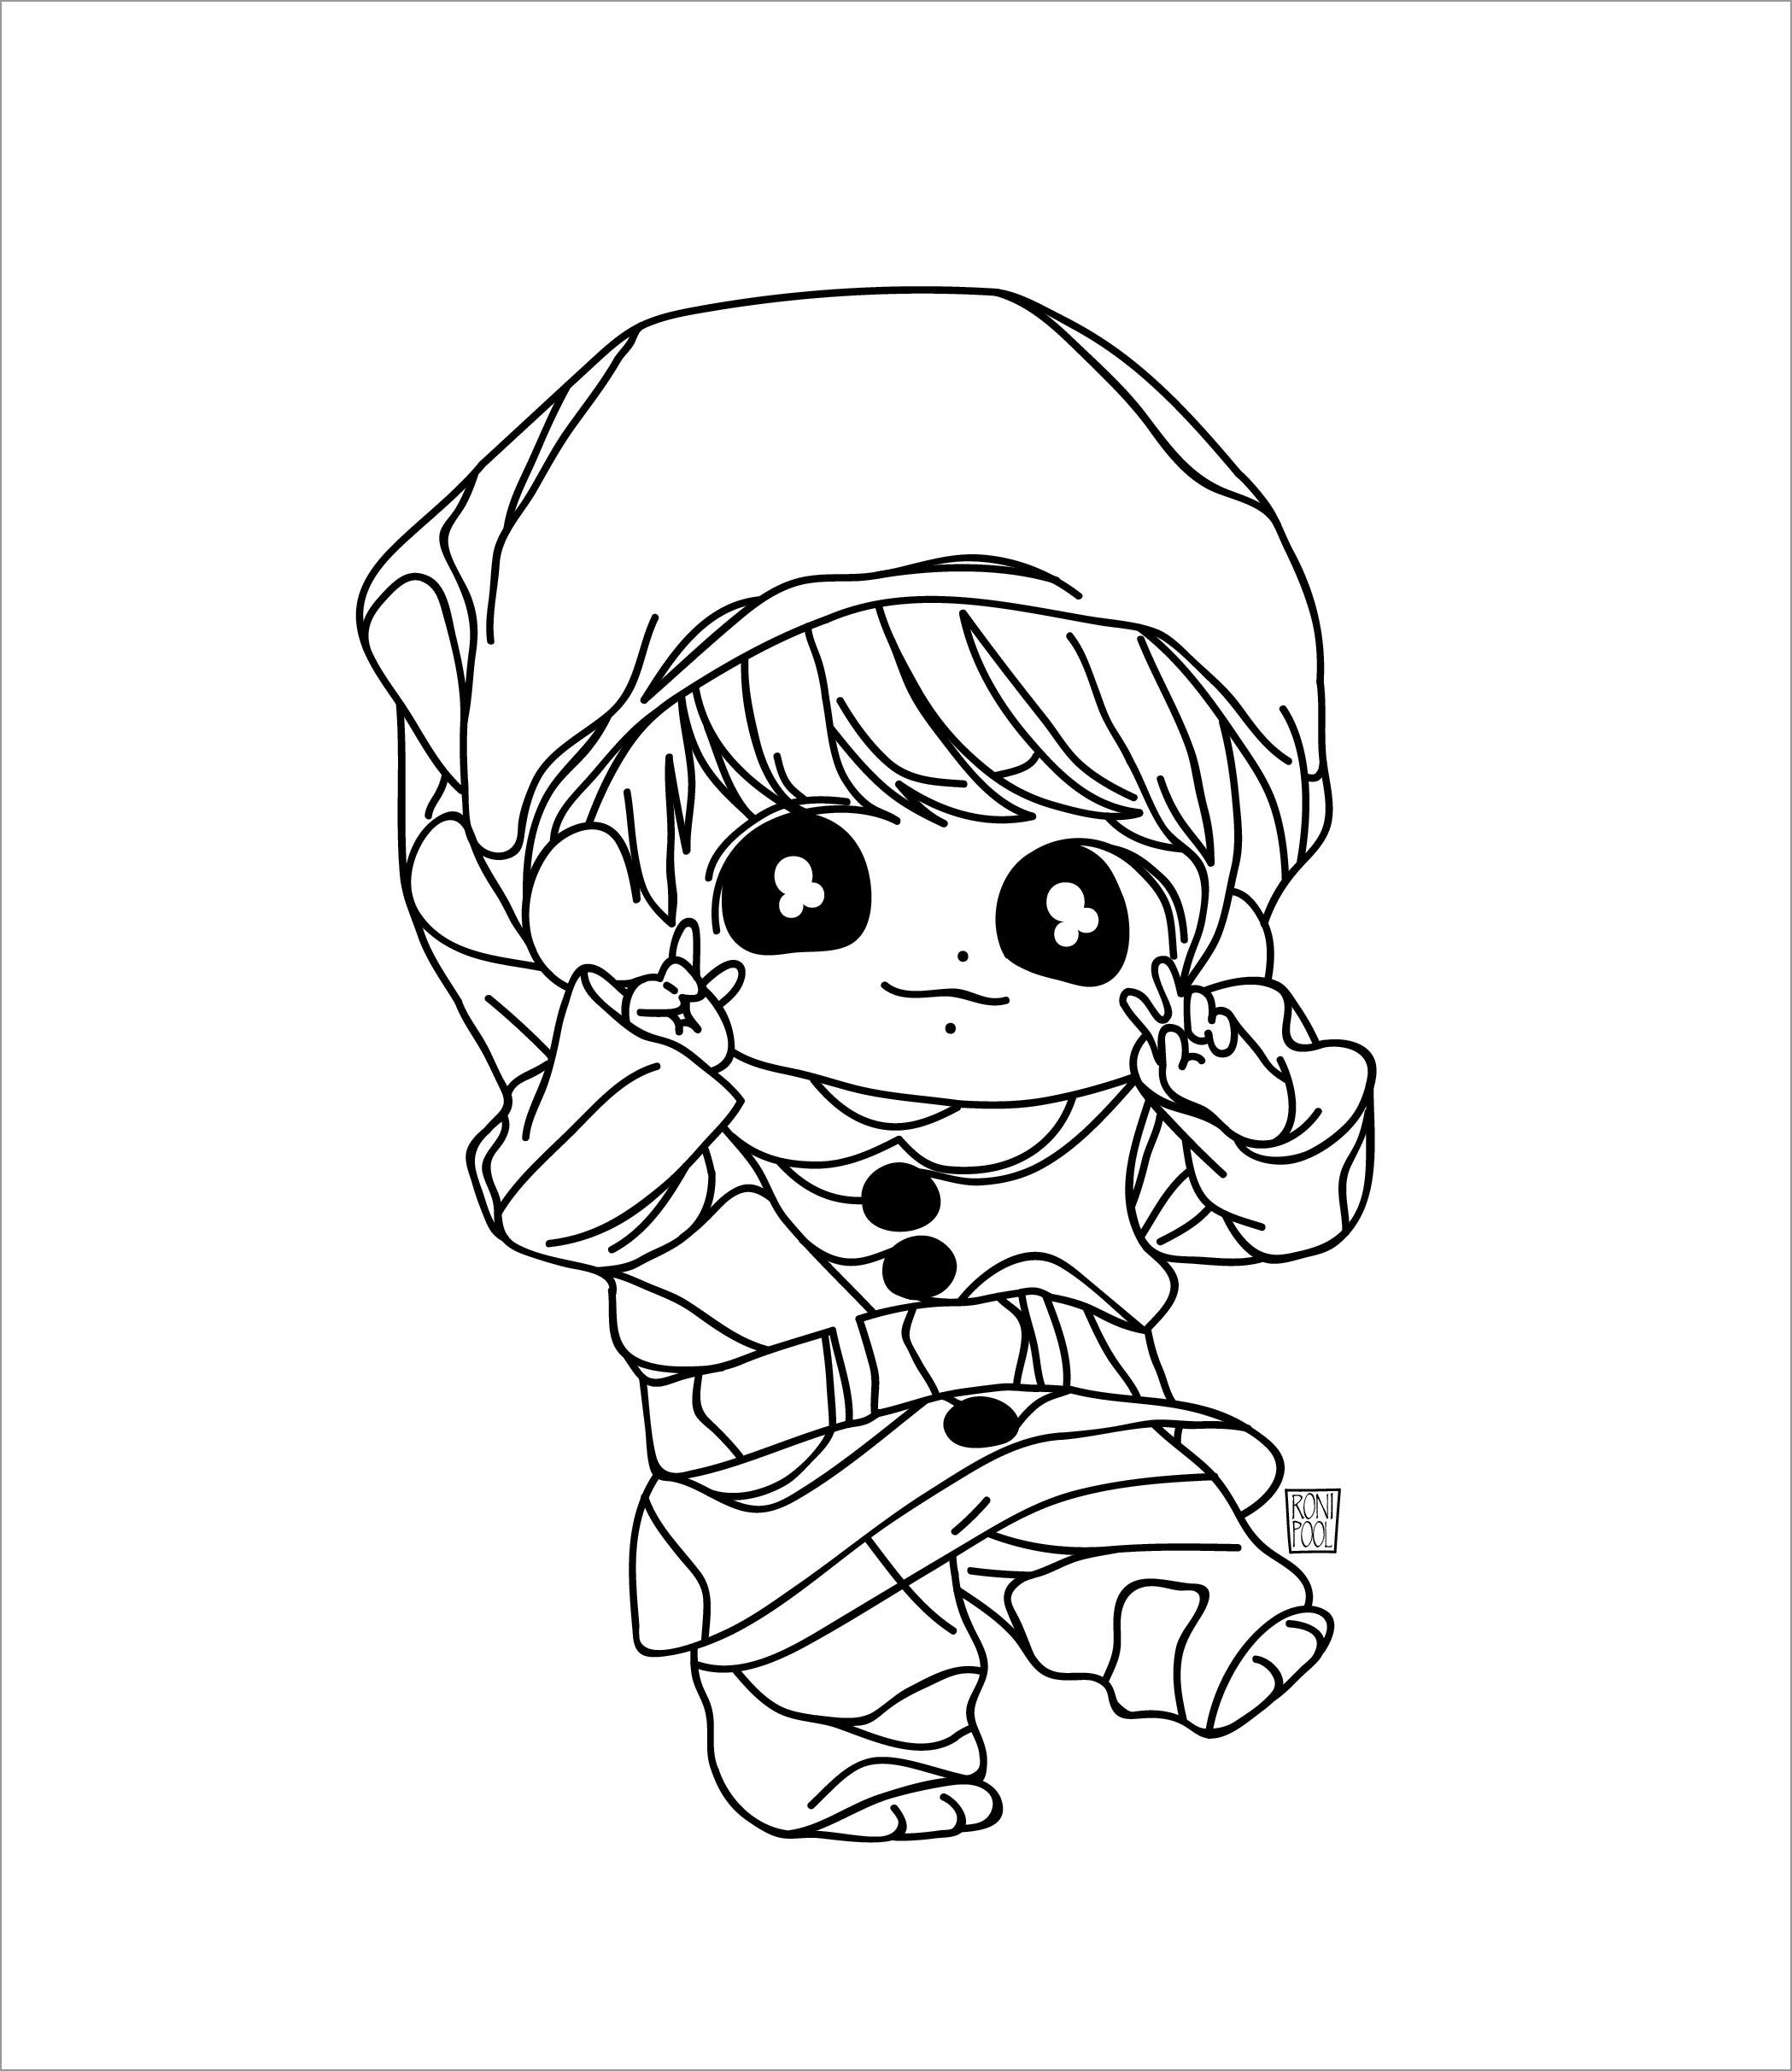 Bts Fanart Jungkook Chibi Coloring Page